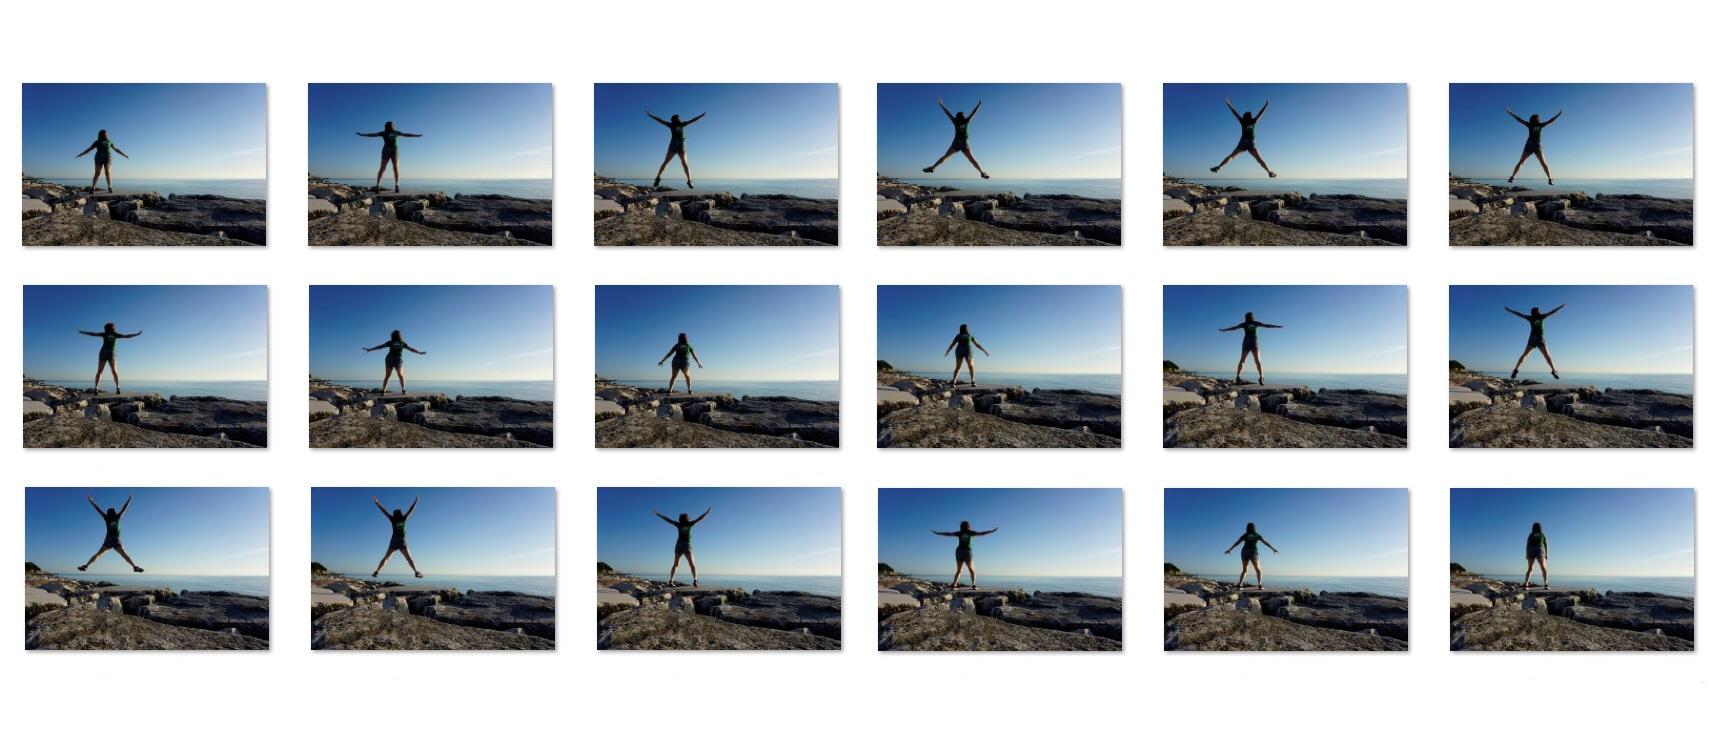 My Peak Challenge Peaker Jump 2020 - sequence